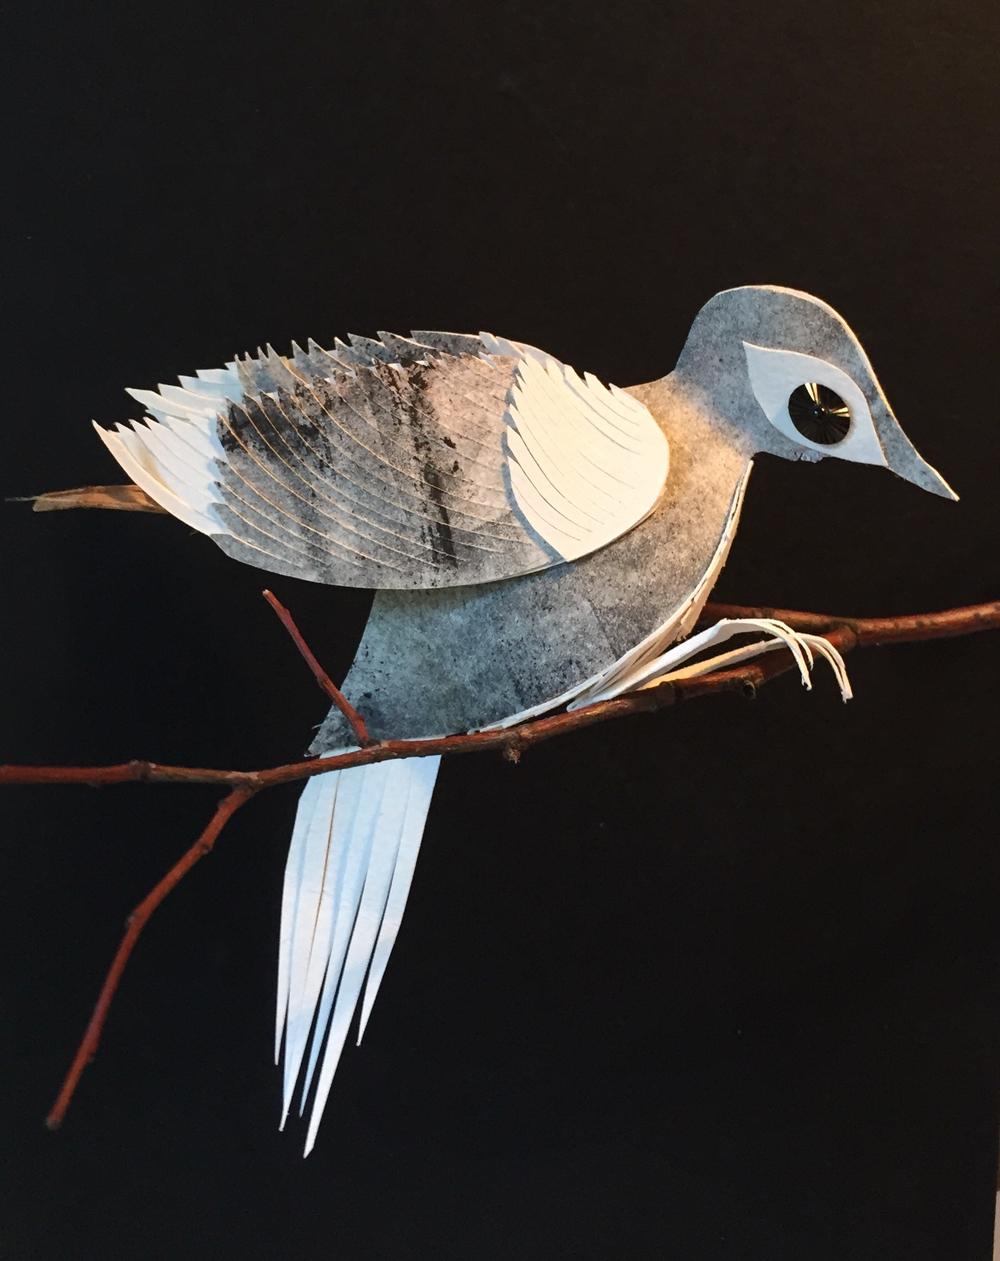 sweet+bird+perching.jpg